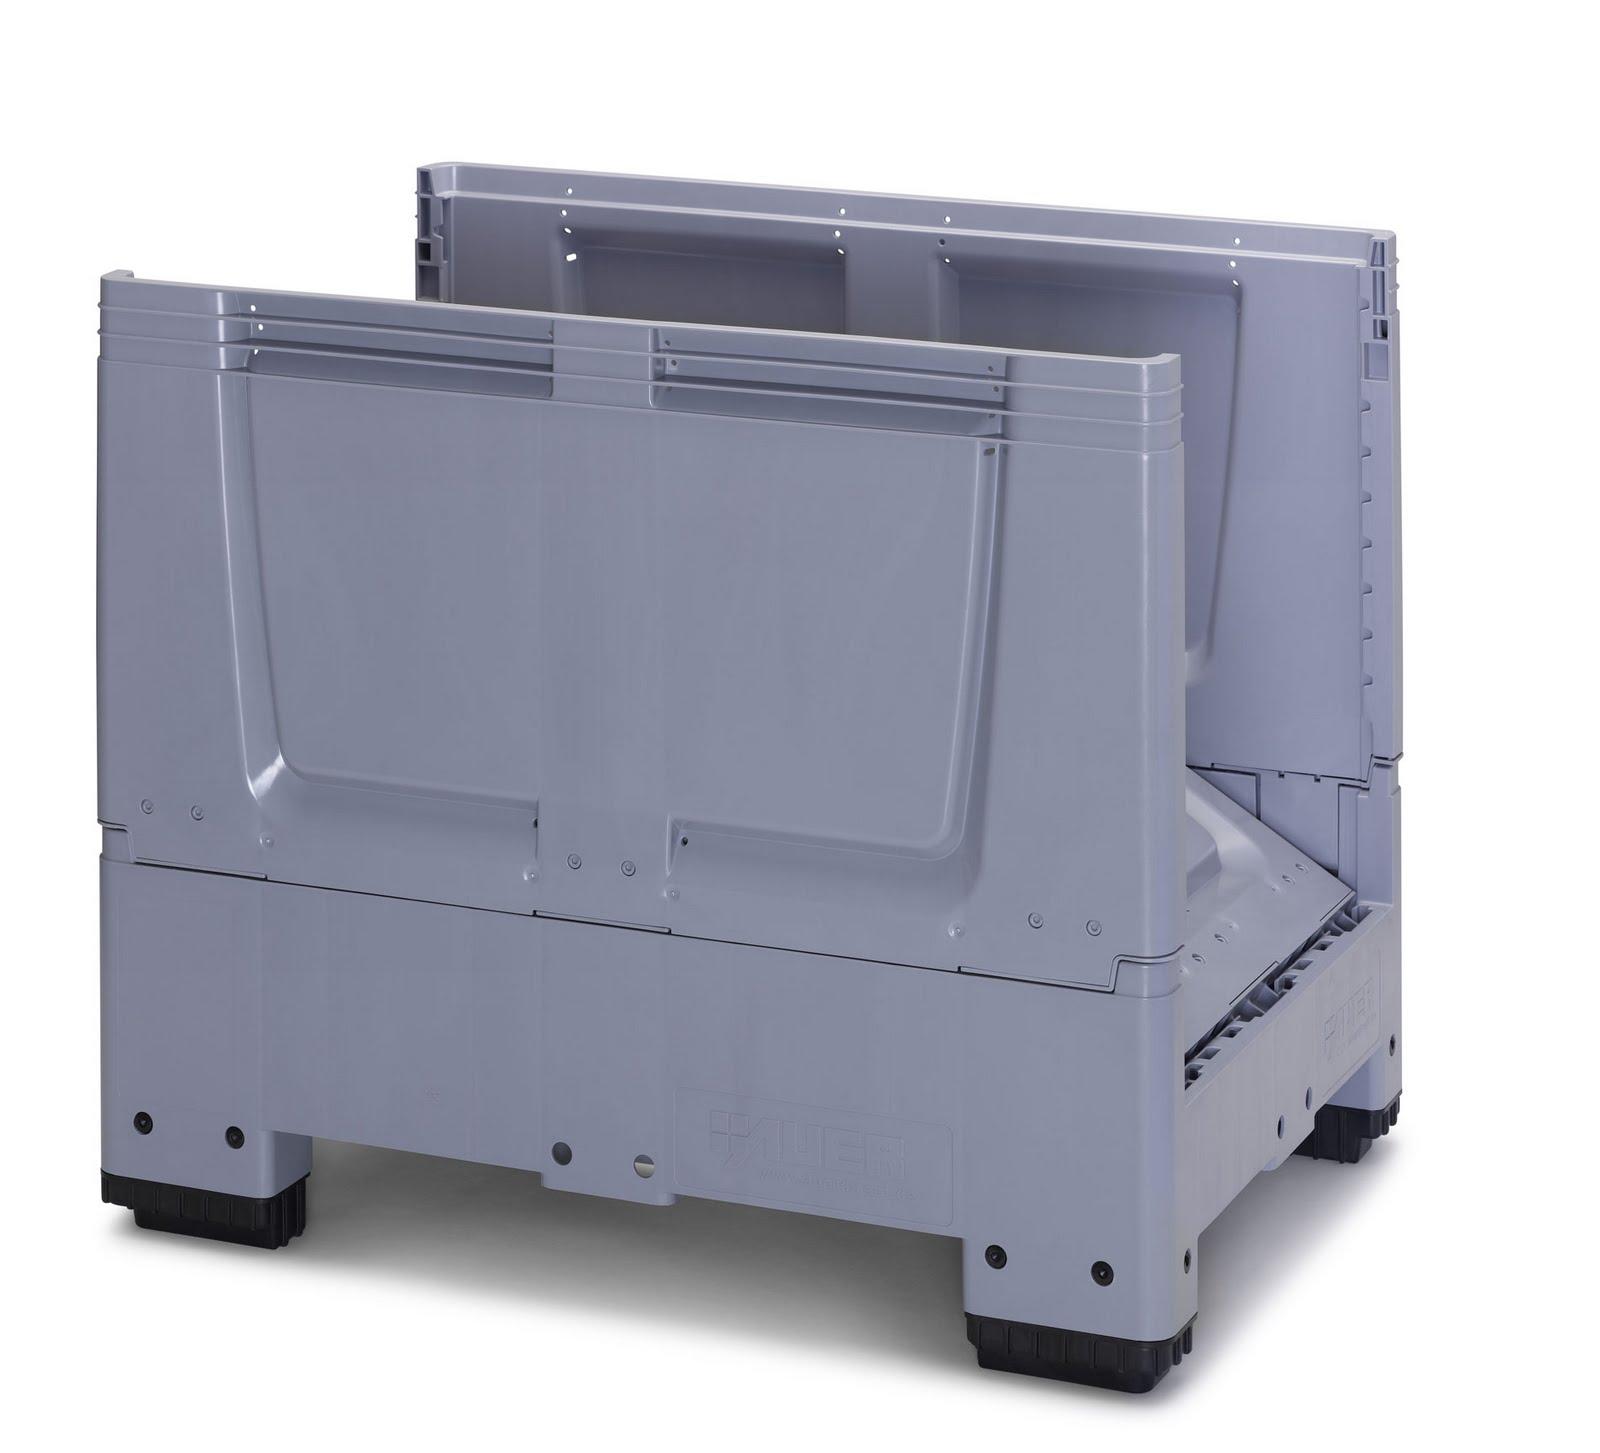 Inka palets barcelona 6 2 caja contenedor plegable - Pallets por contenedor ...